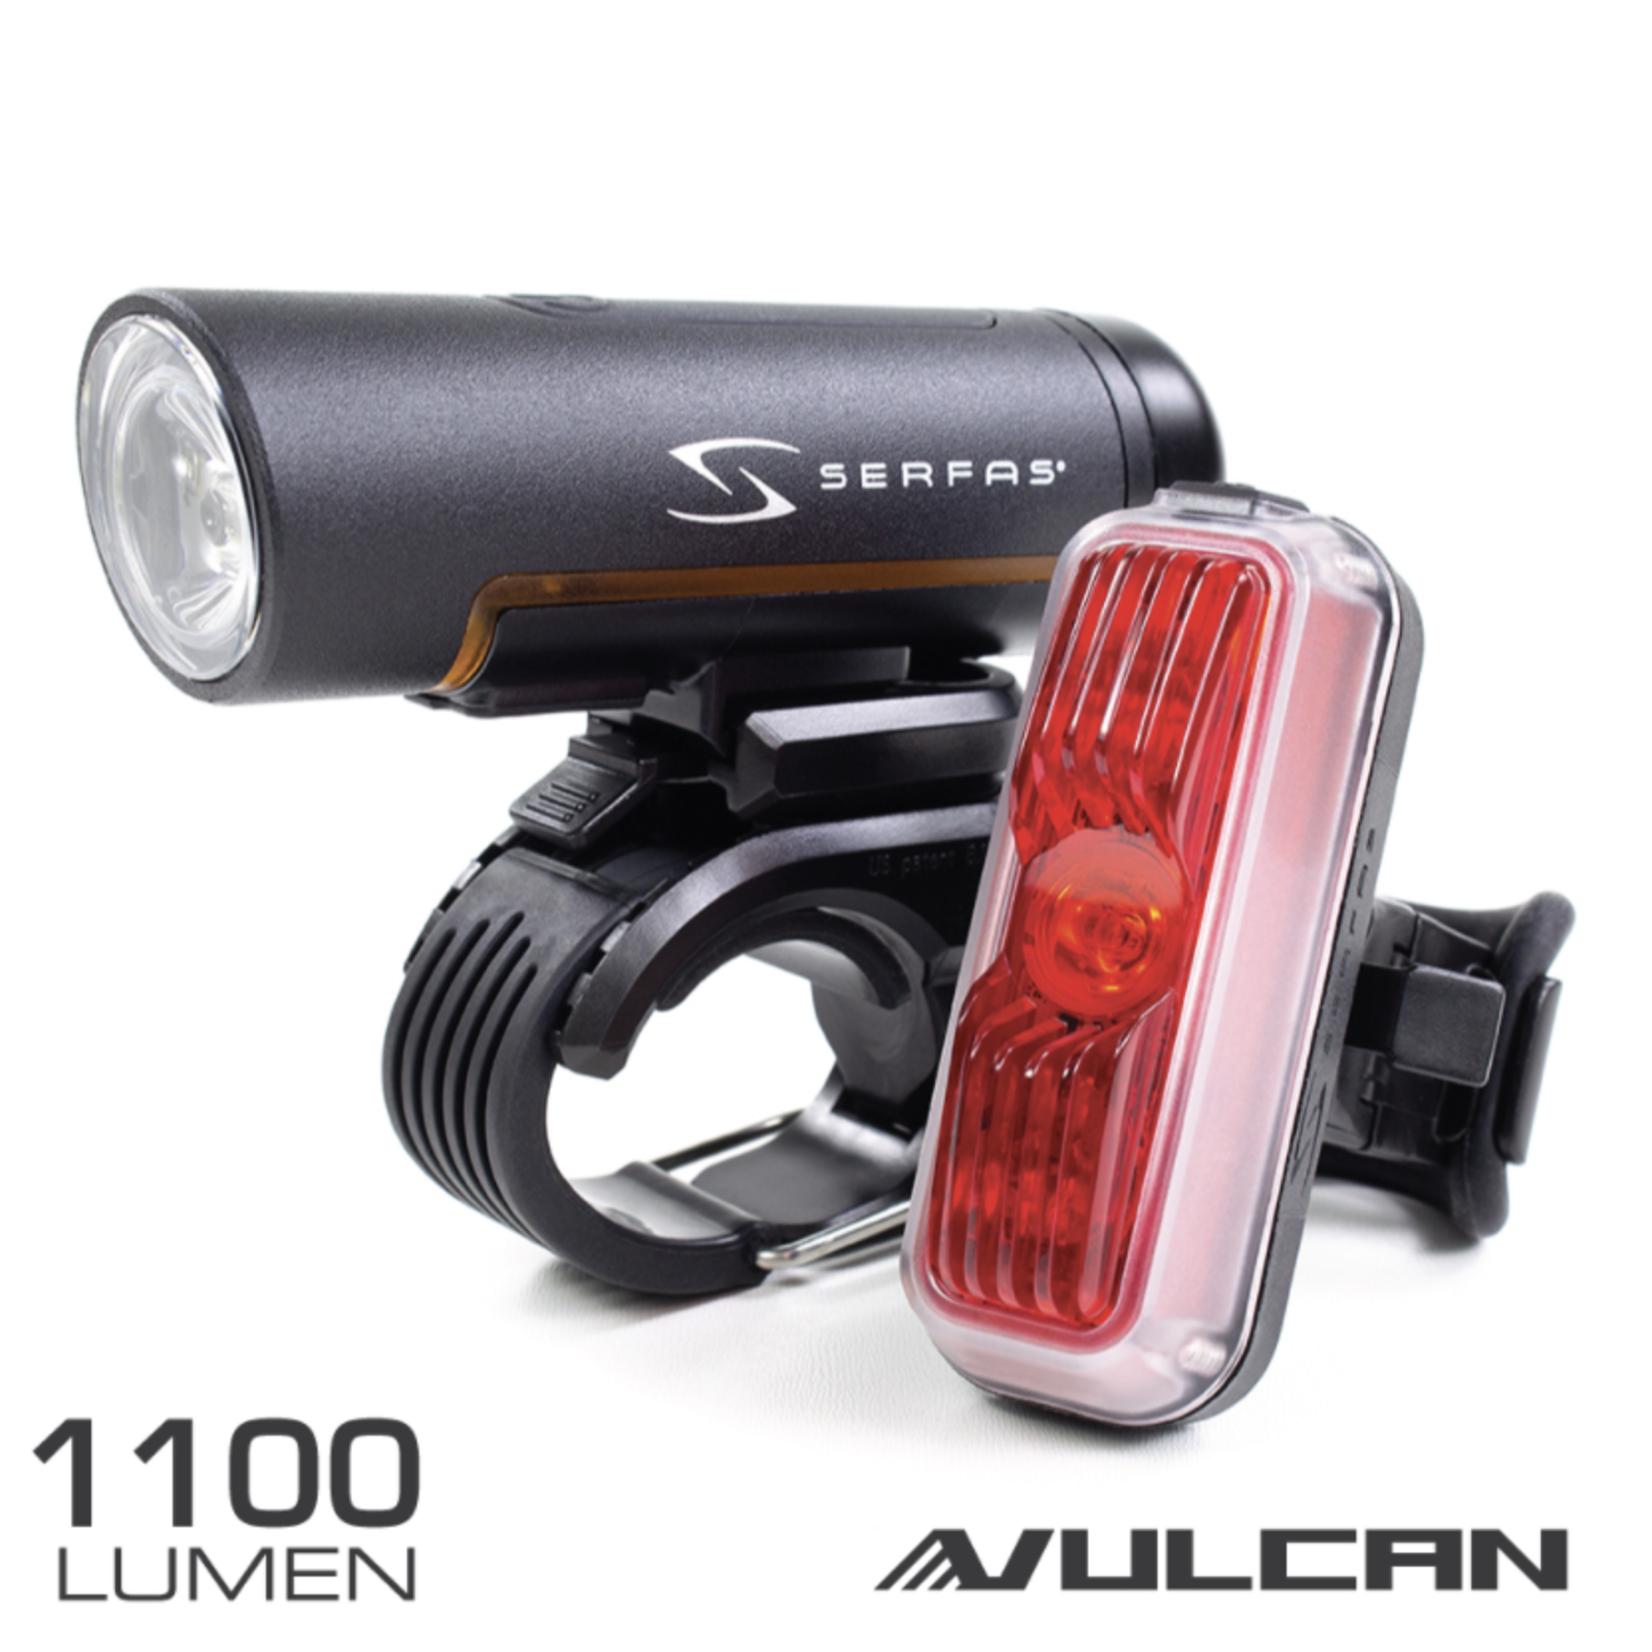 SERFAS TSC-8 TRUE 1100C/VULCAN 350 COMBO (SERFAS)